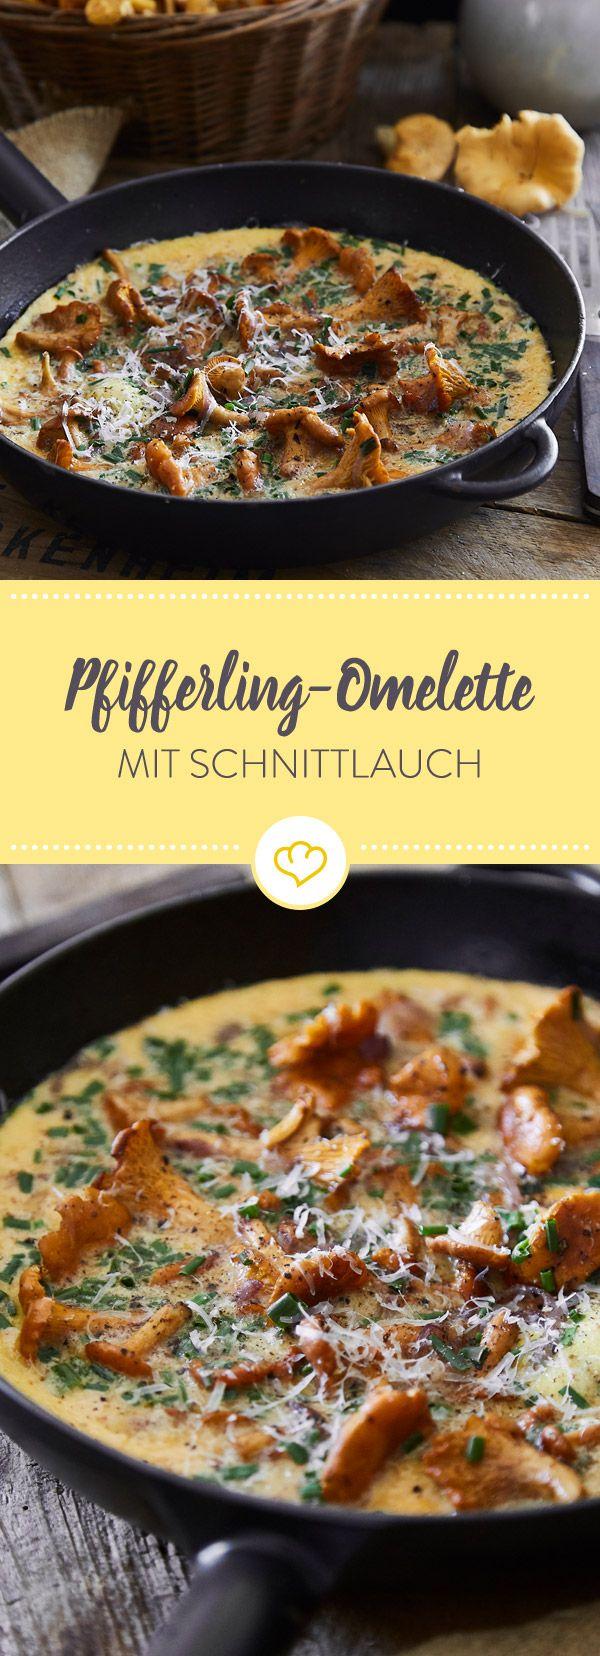 best 10 omelettes ideas on pinterest vegetable omelette recipes easy omelette recipe and. Black Bedroom Furniture Sets. Home Design Ideas